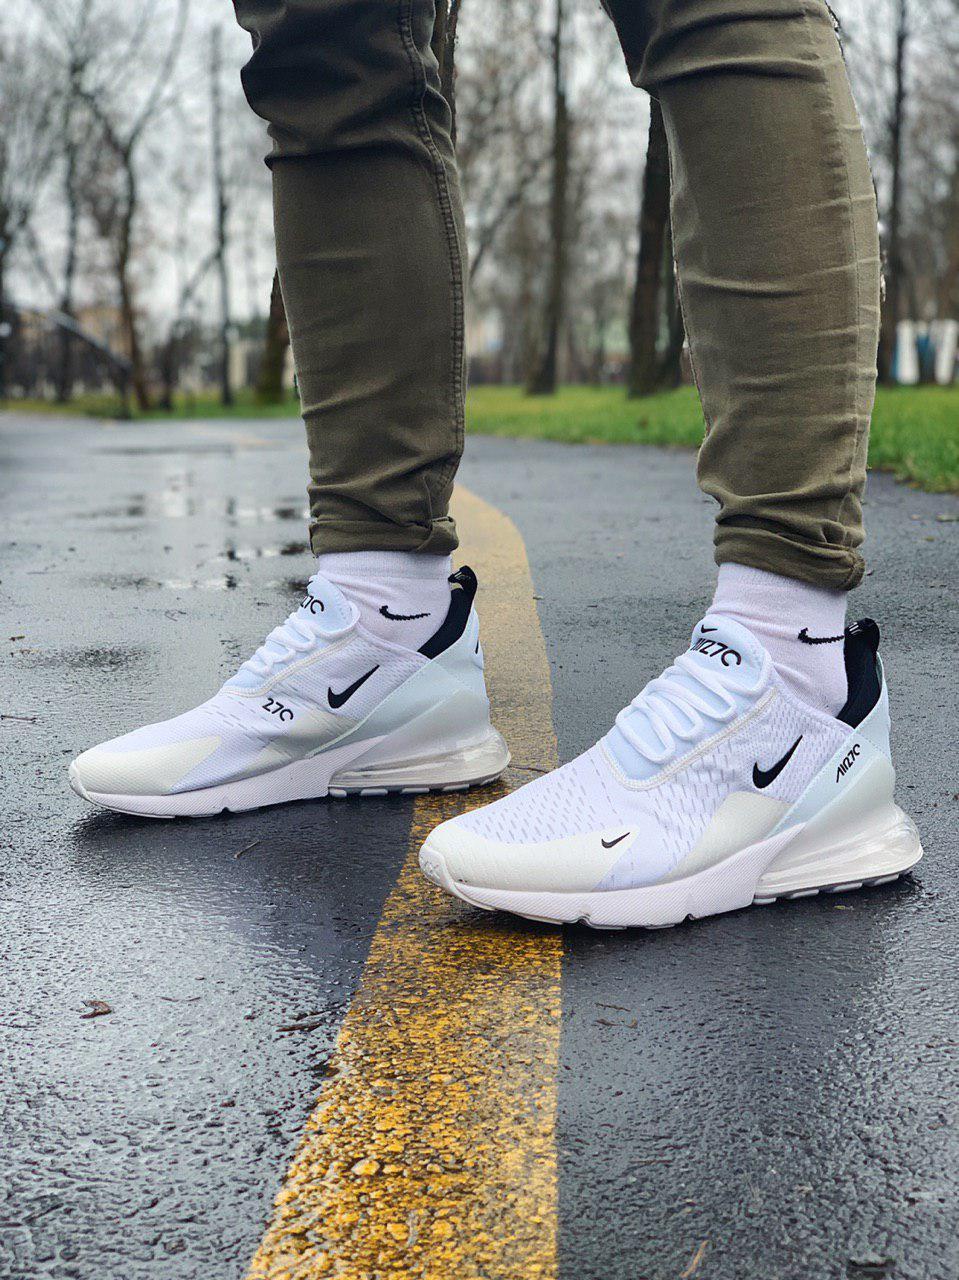 Кроссовки Nike Air Max 270 Найк Аир Макс (41,42,43,44,45)